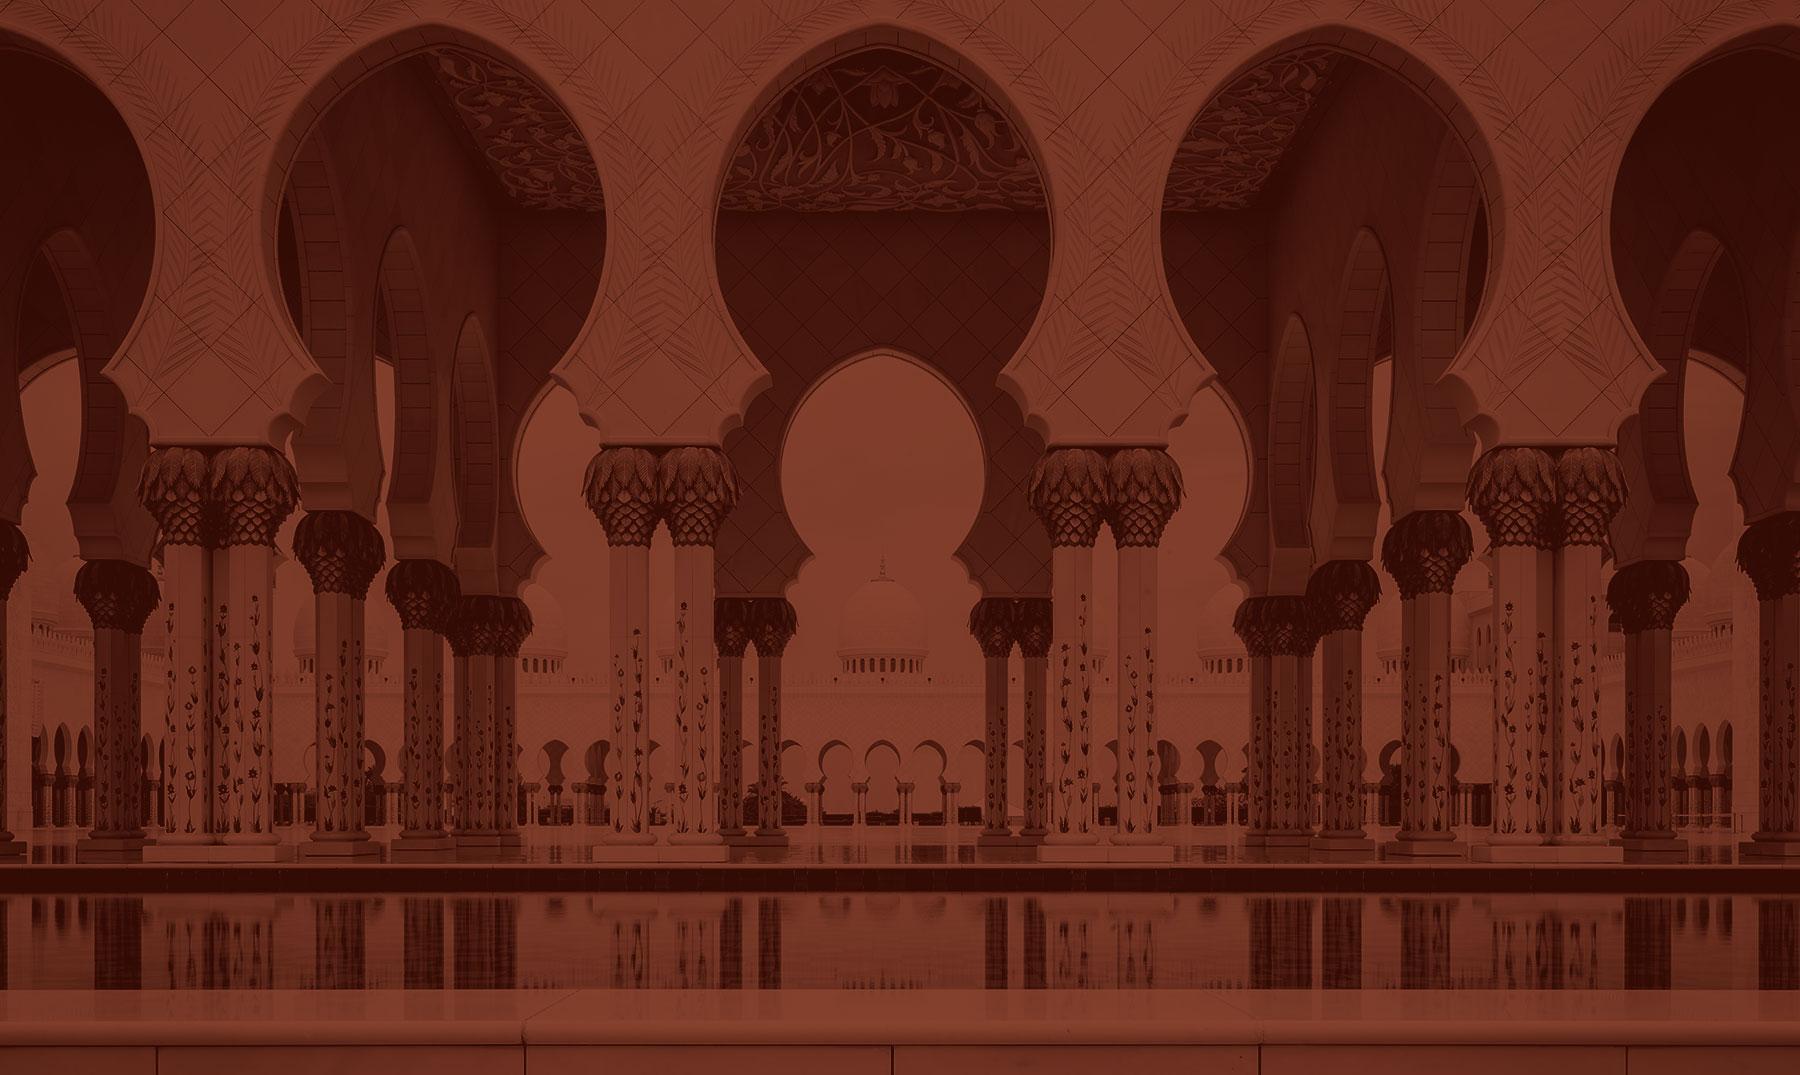 http://www.bethelanguage.com/wp-content/uploads/2018/08/Background-Arabic-Be-The-Language.jpg